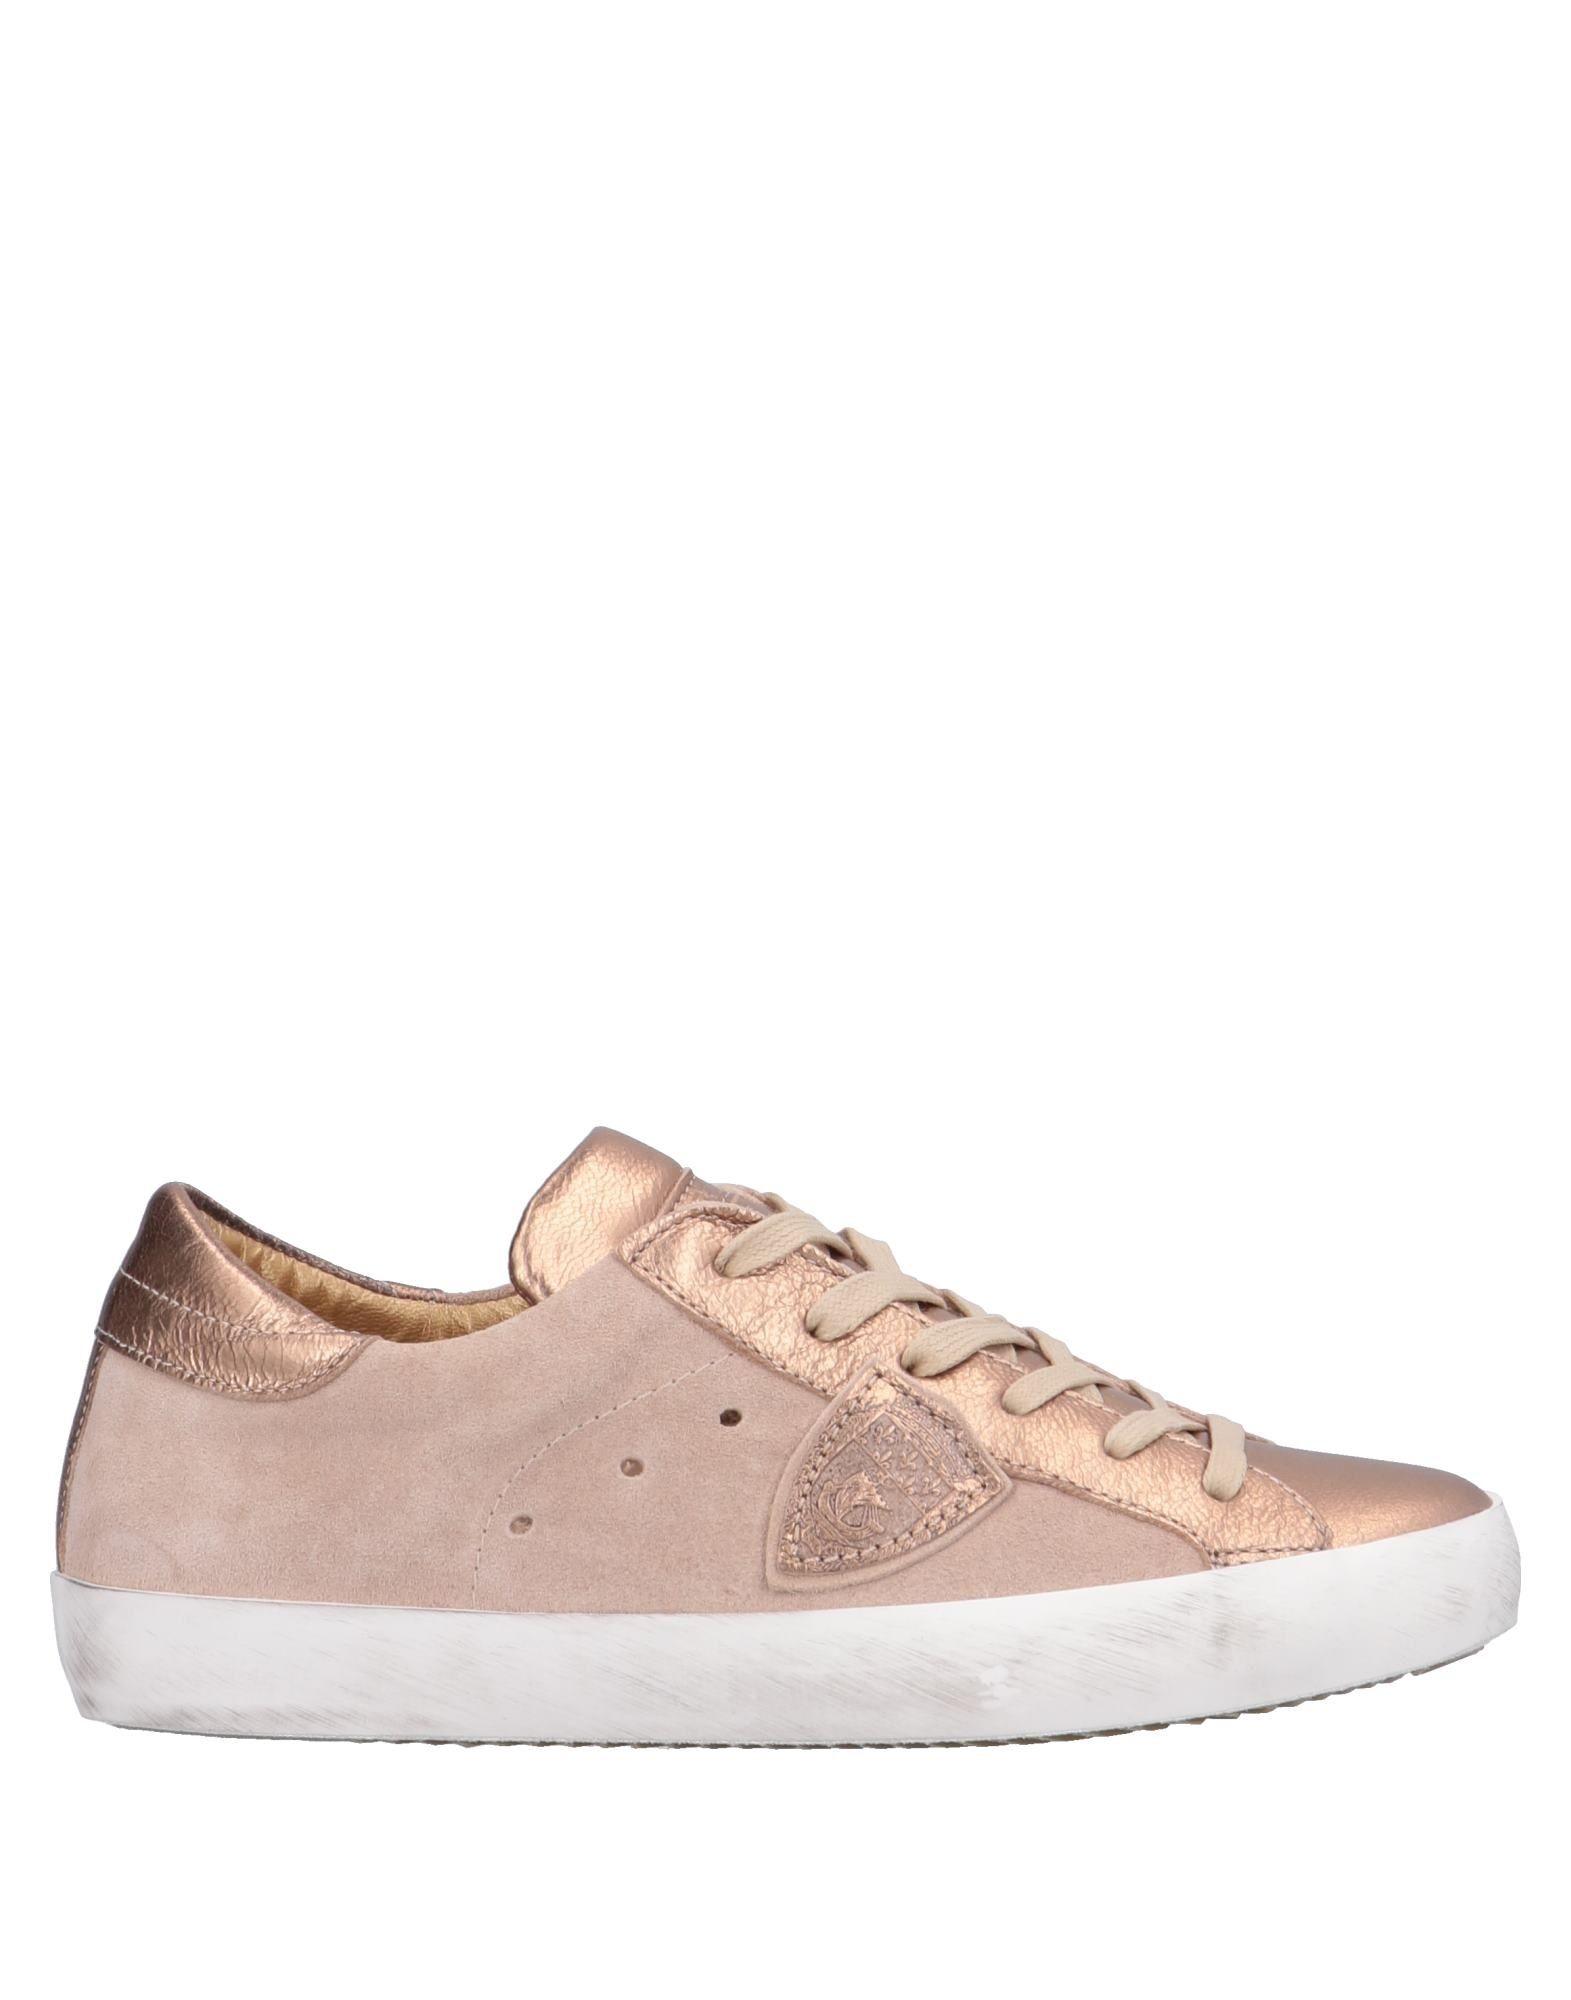 Philippe Model Sneakers - Women Philippe  Model Sneakers online on  Philippe United Kingdom - 11562626NJ 78bab1